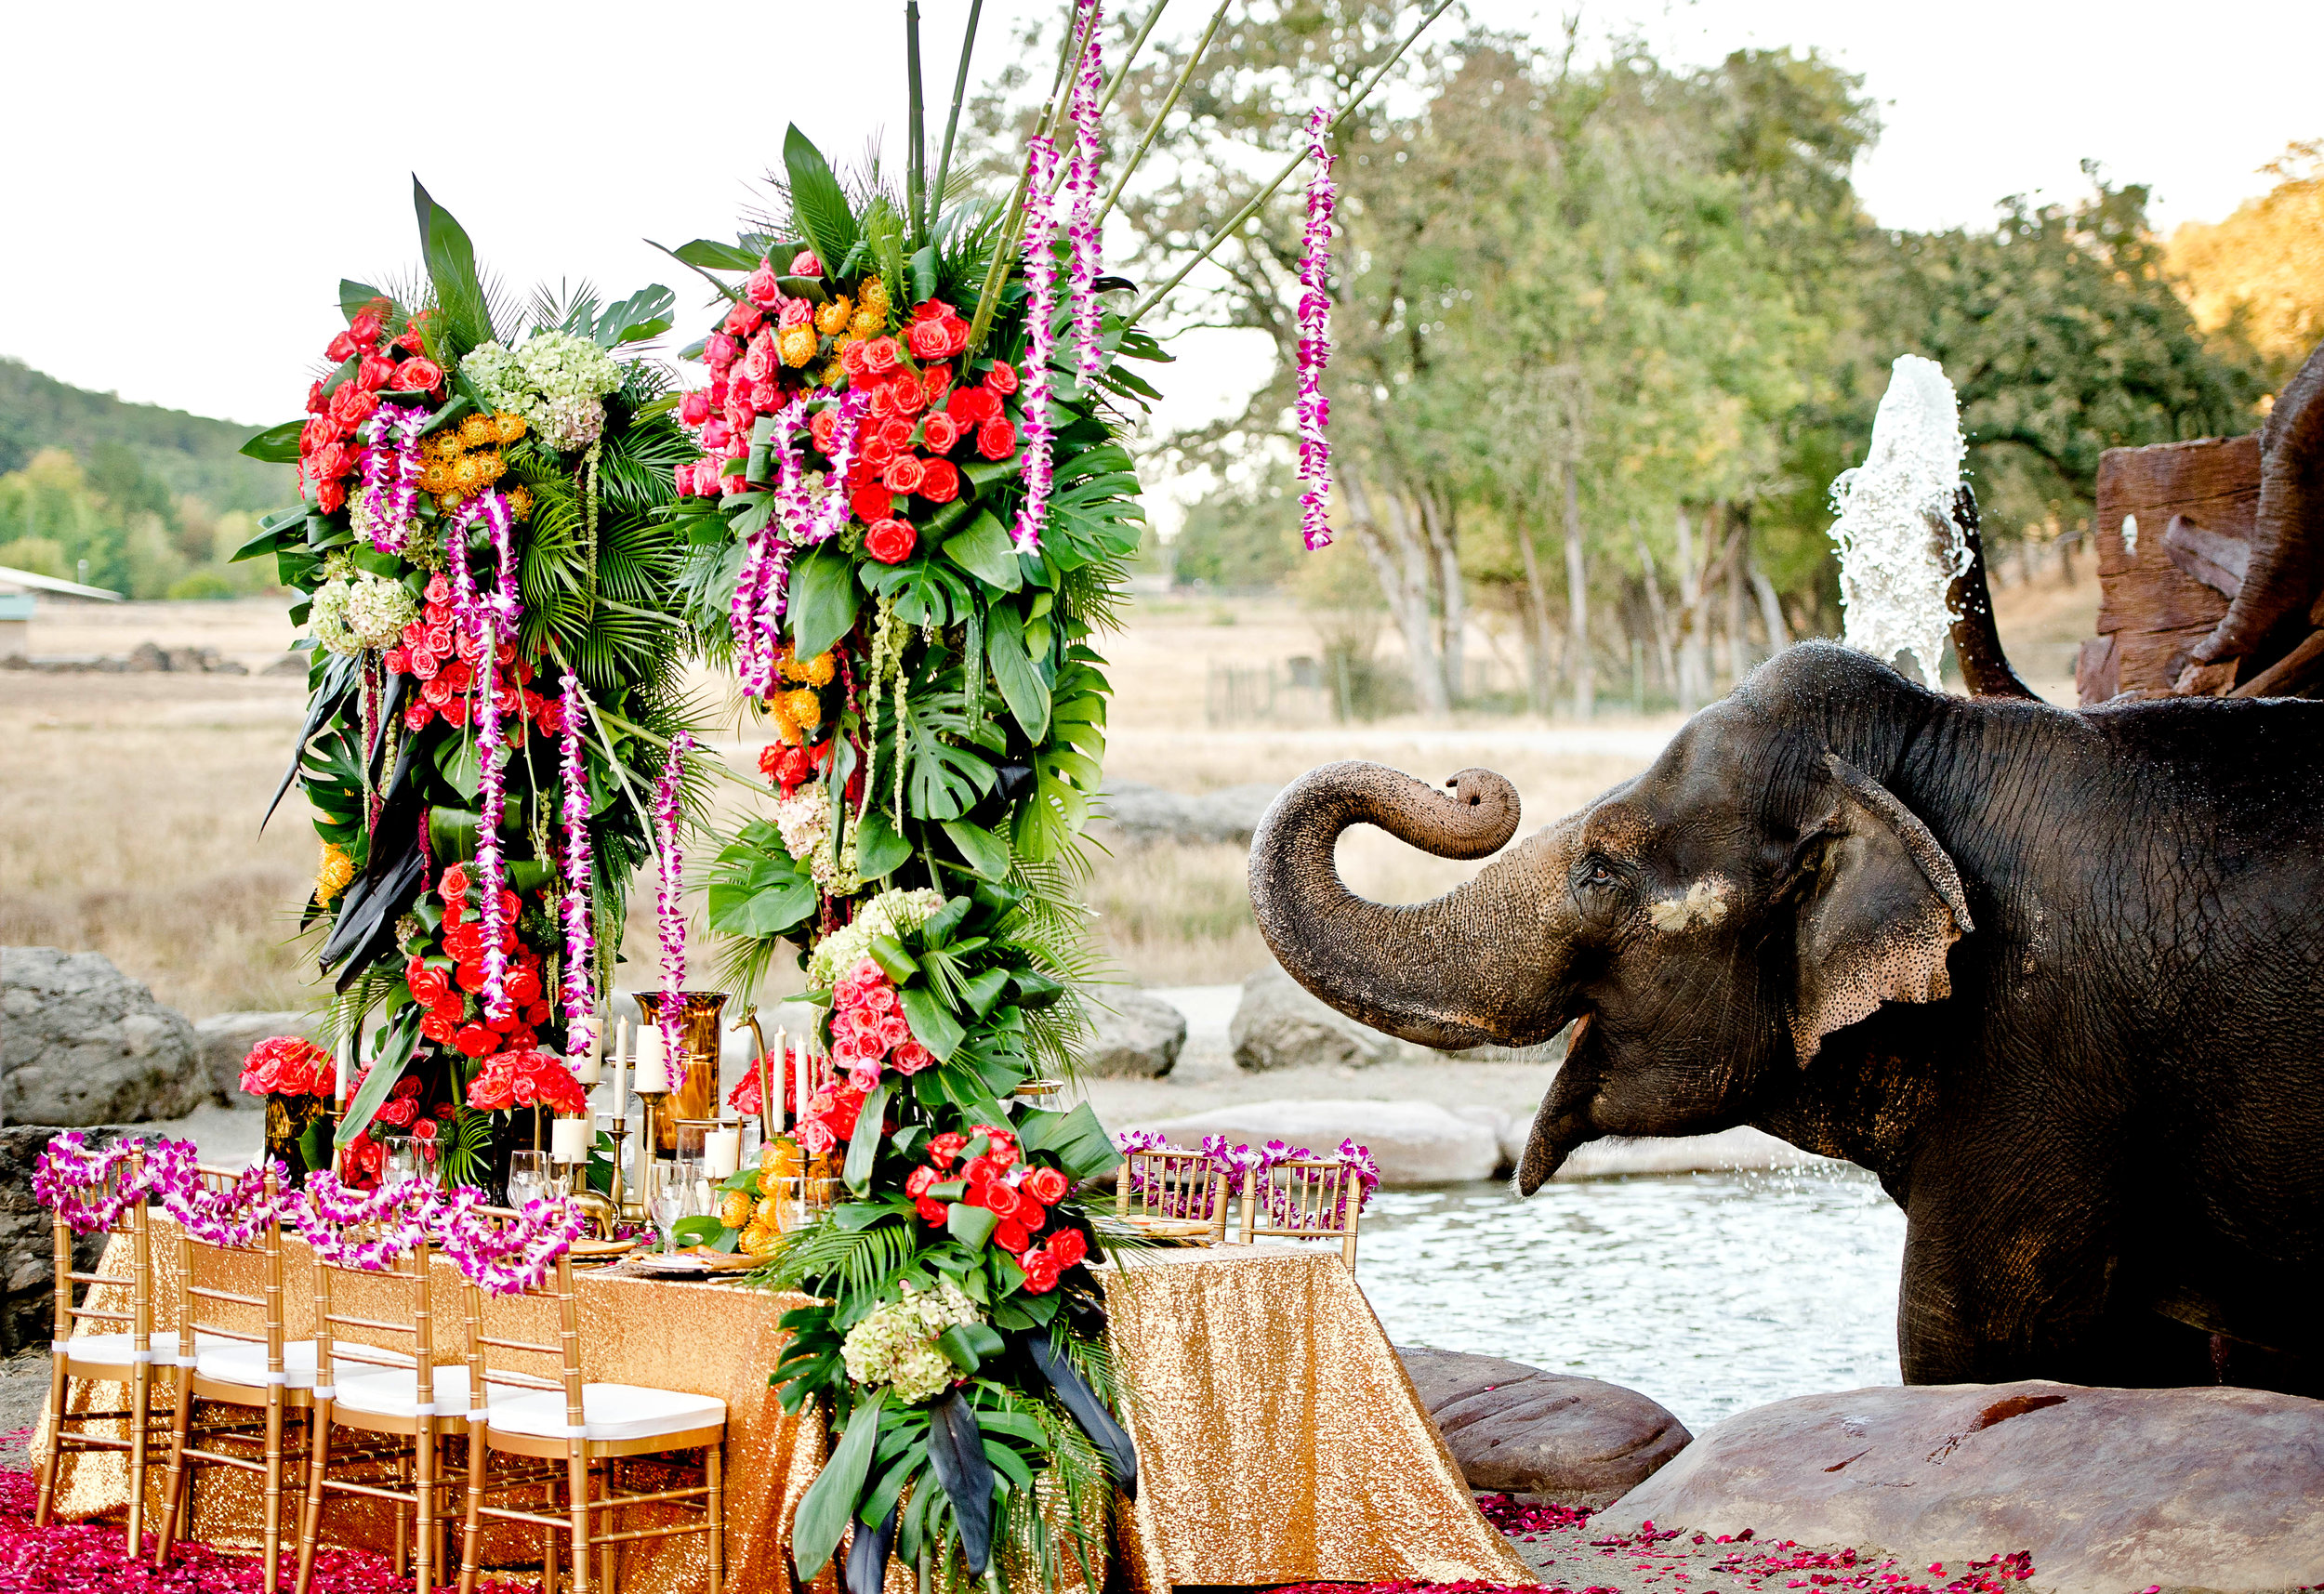 3353-moscastudio-the-perfect-occasion-grace-ormonde-wedding-style-editorial-20160825-PRINT-v2.jpg